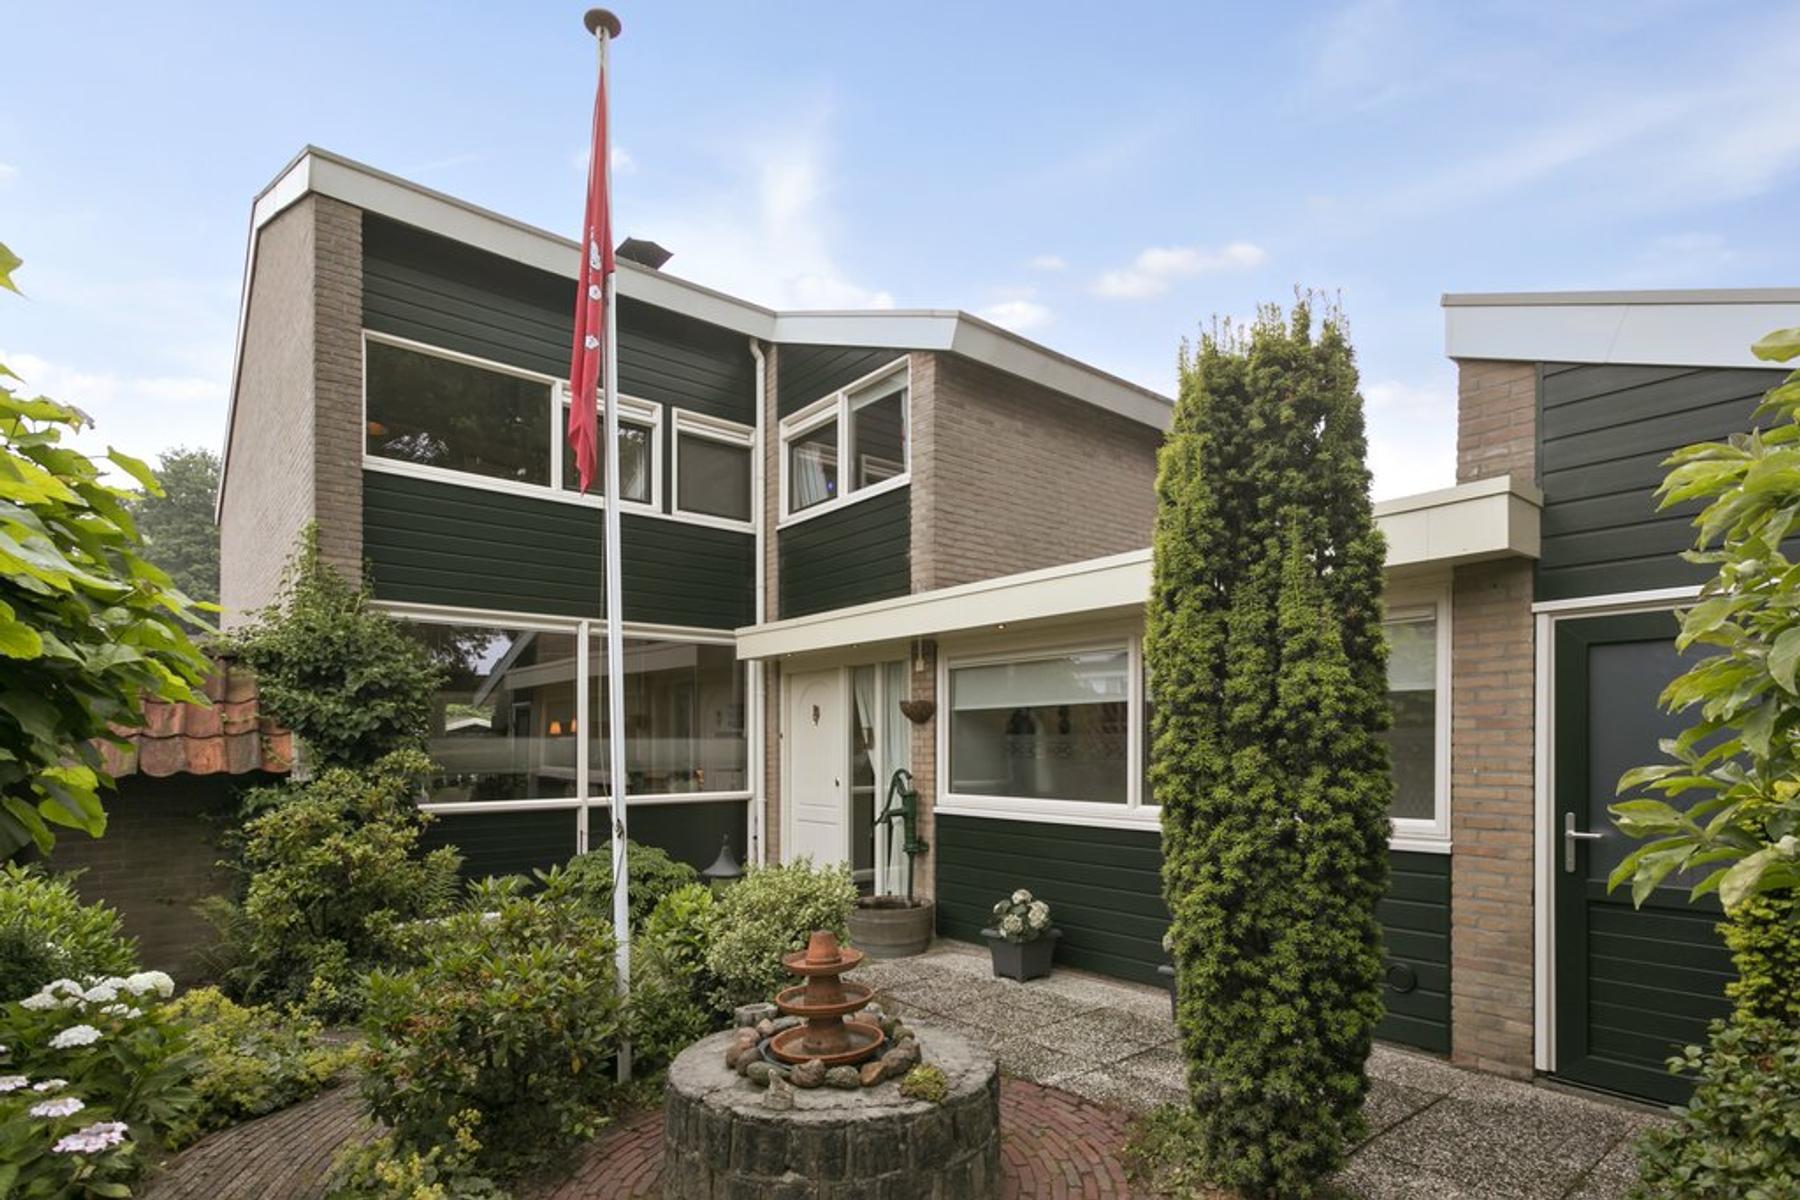 Weldinkhorst 29 in Enschede 7531 EJ